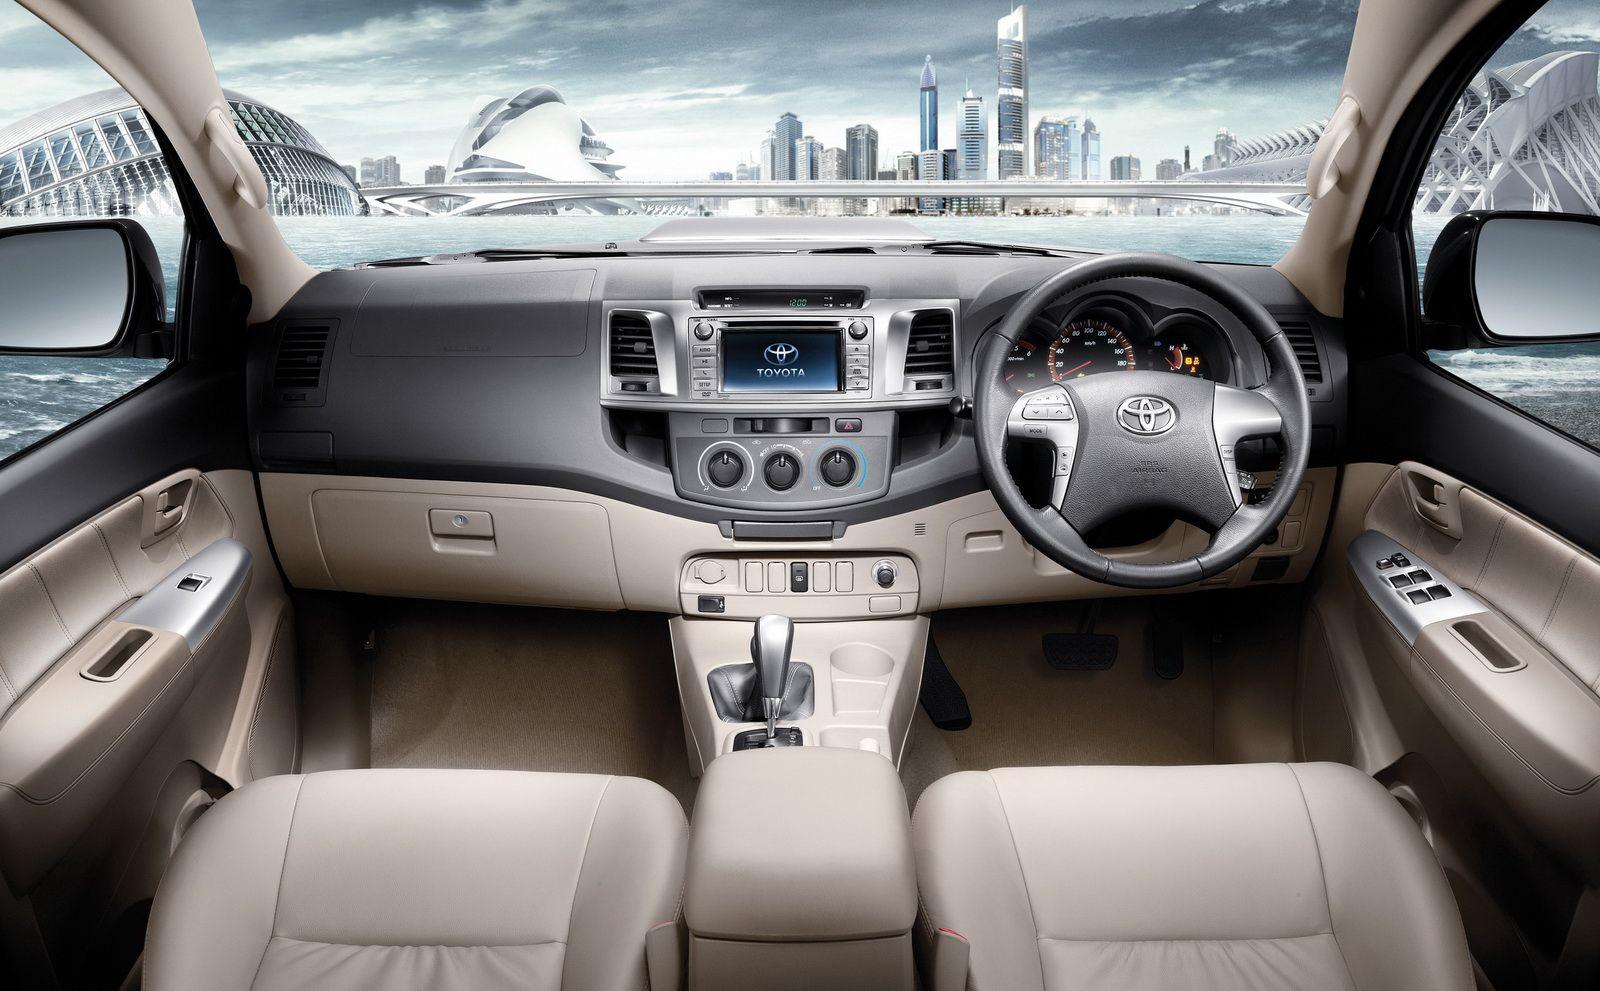 Toyota Hilux 25 - Interior.  Toyota hilux, Toyota tacoma